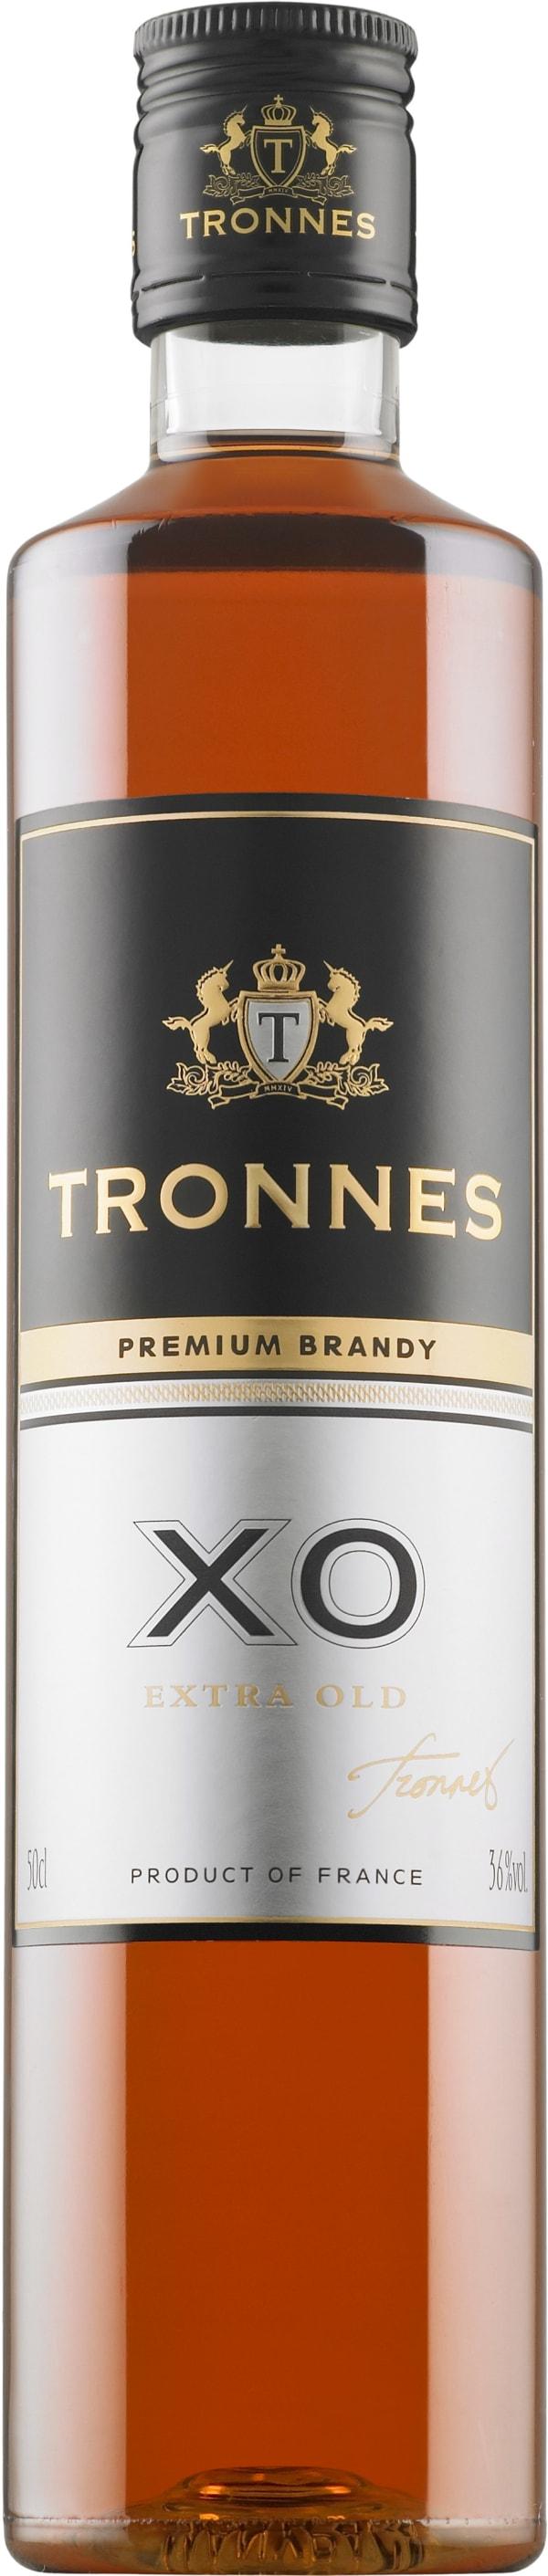 Tronnes XO plastic bottle